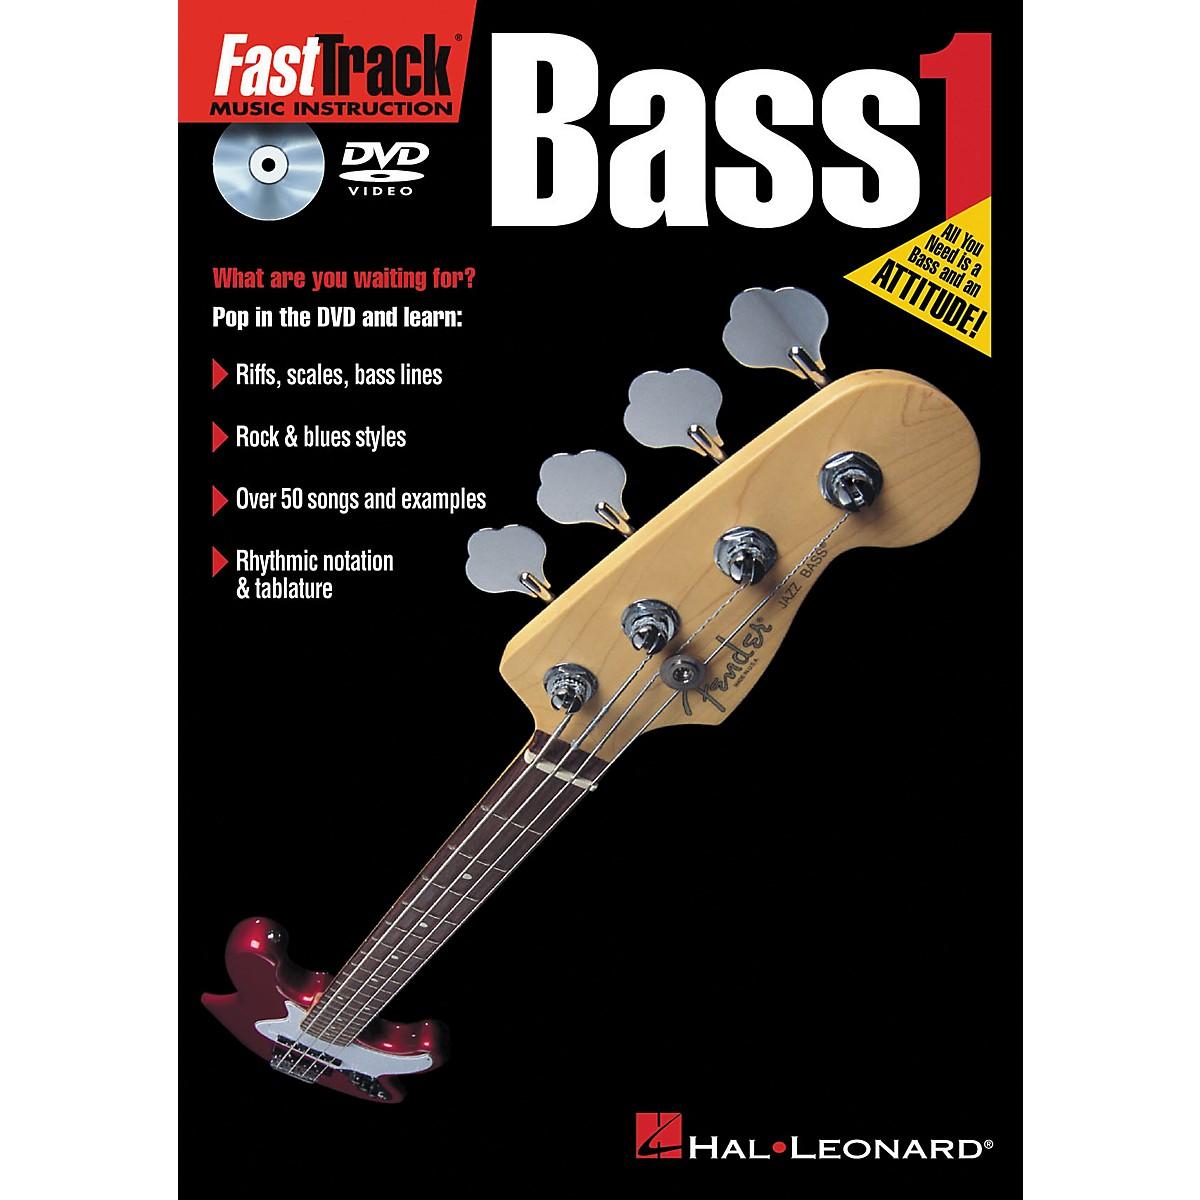 Hal Leonard FastTrack Bass 1 (DVD)